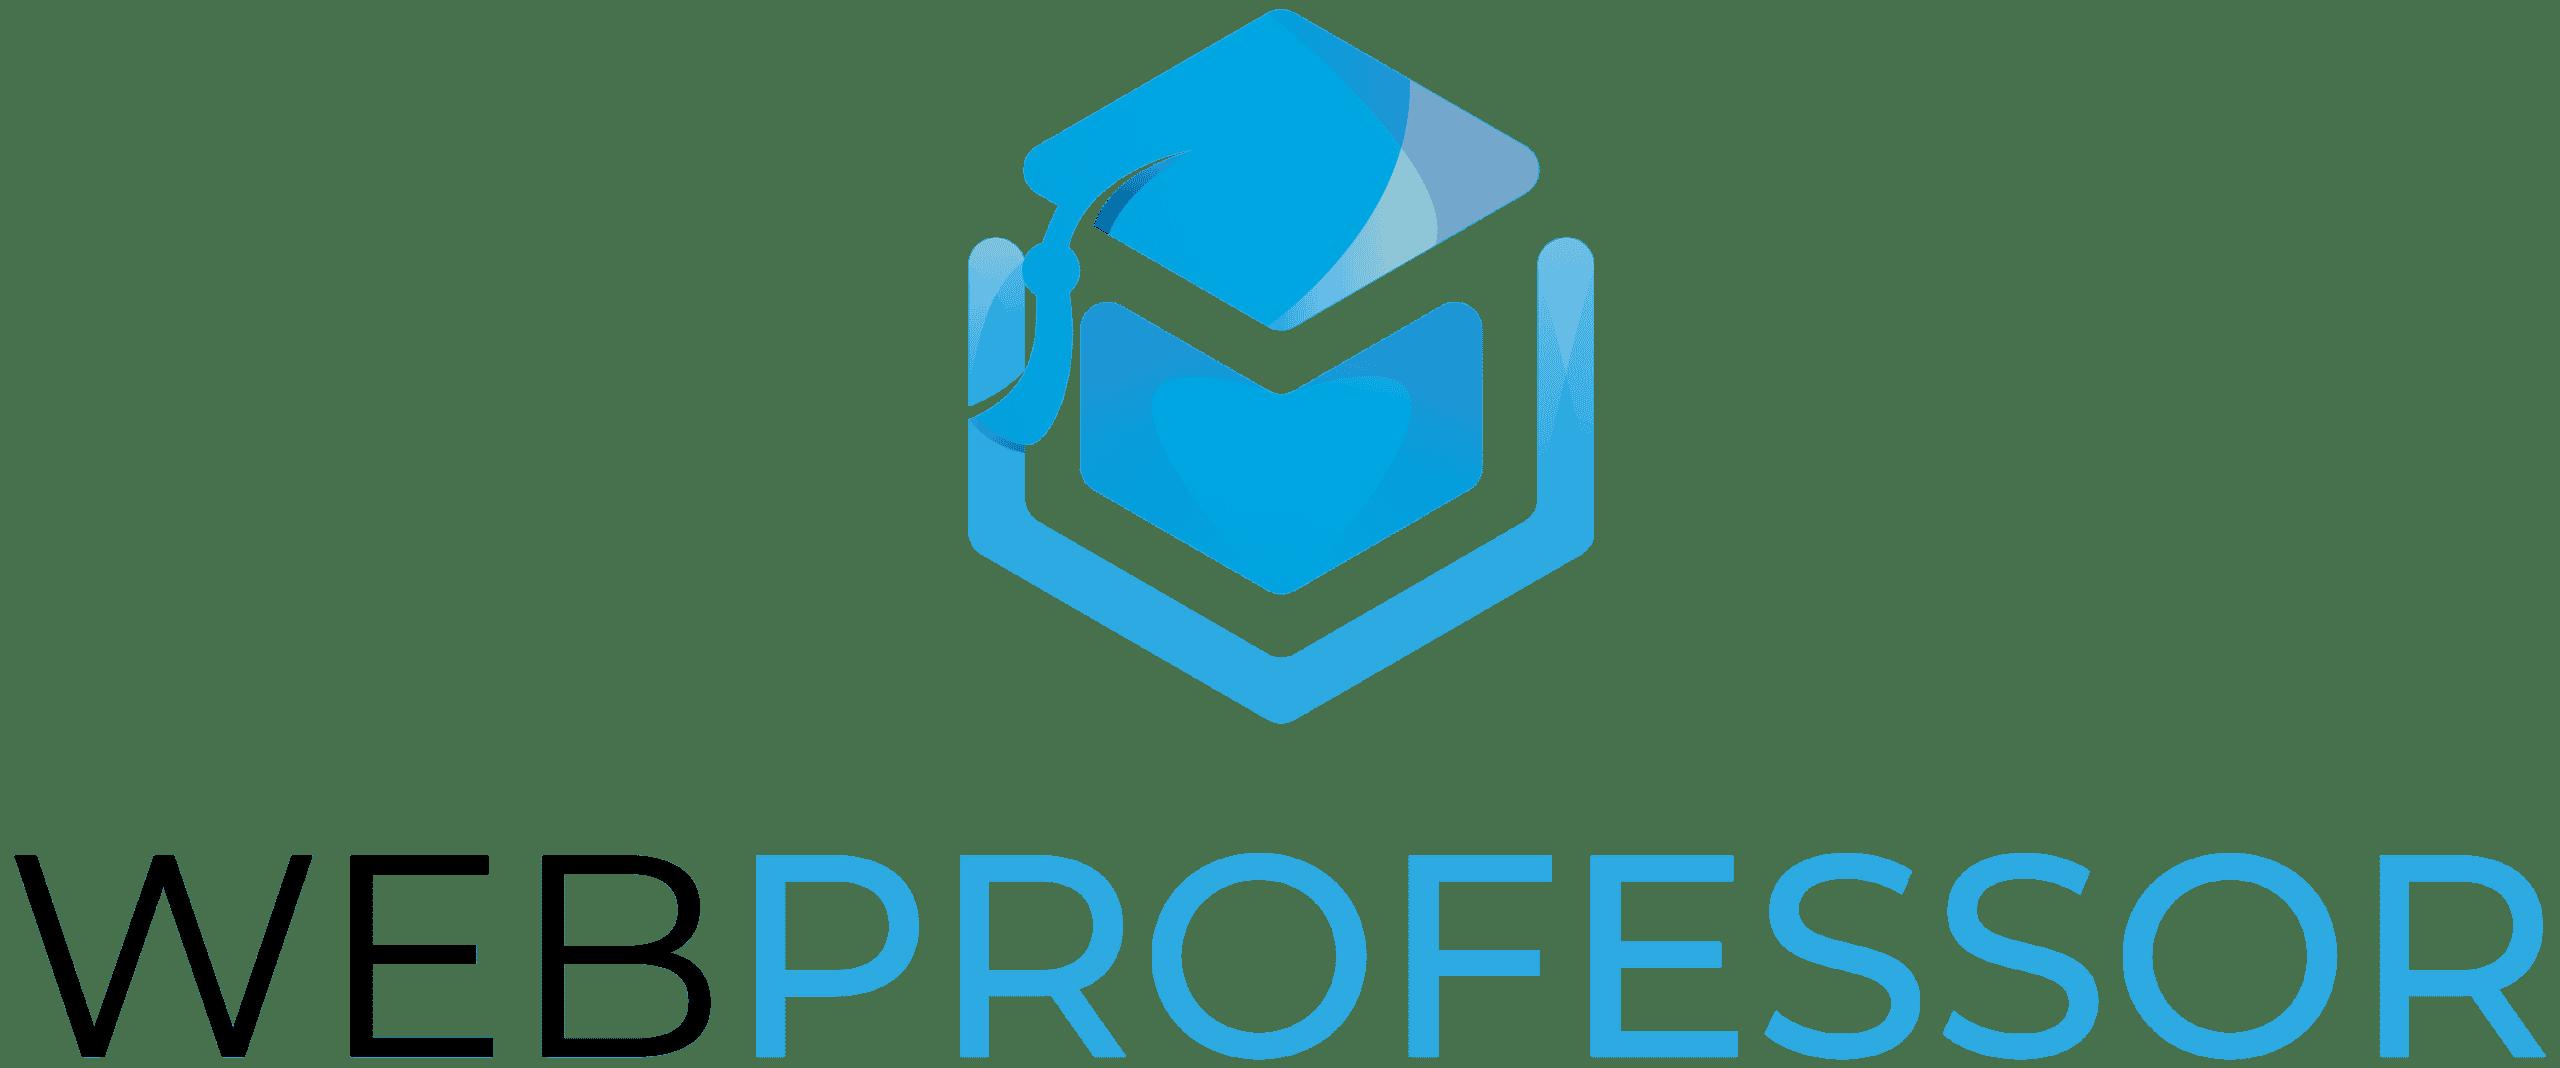 Web Professor